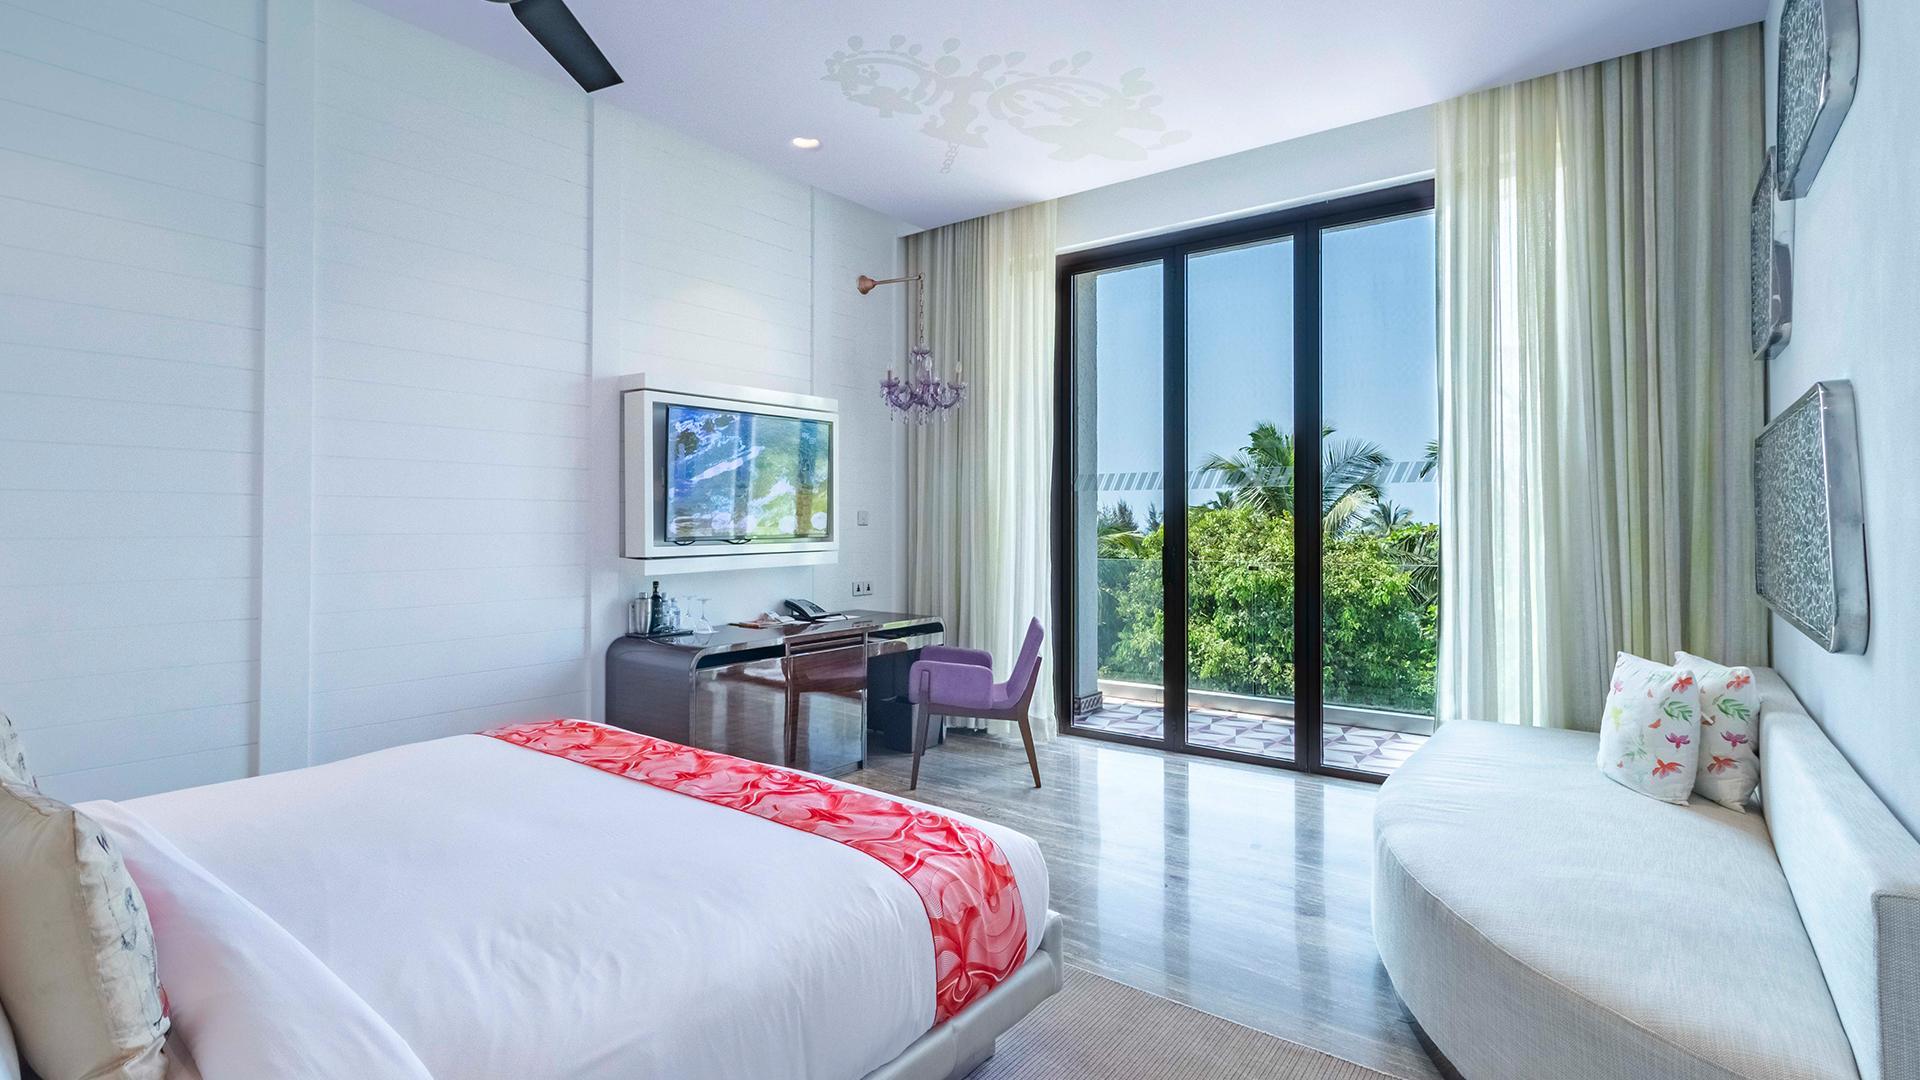 Wonderful Room image 1 at W Goa by North Goa, Goa, India